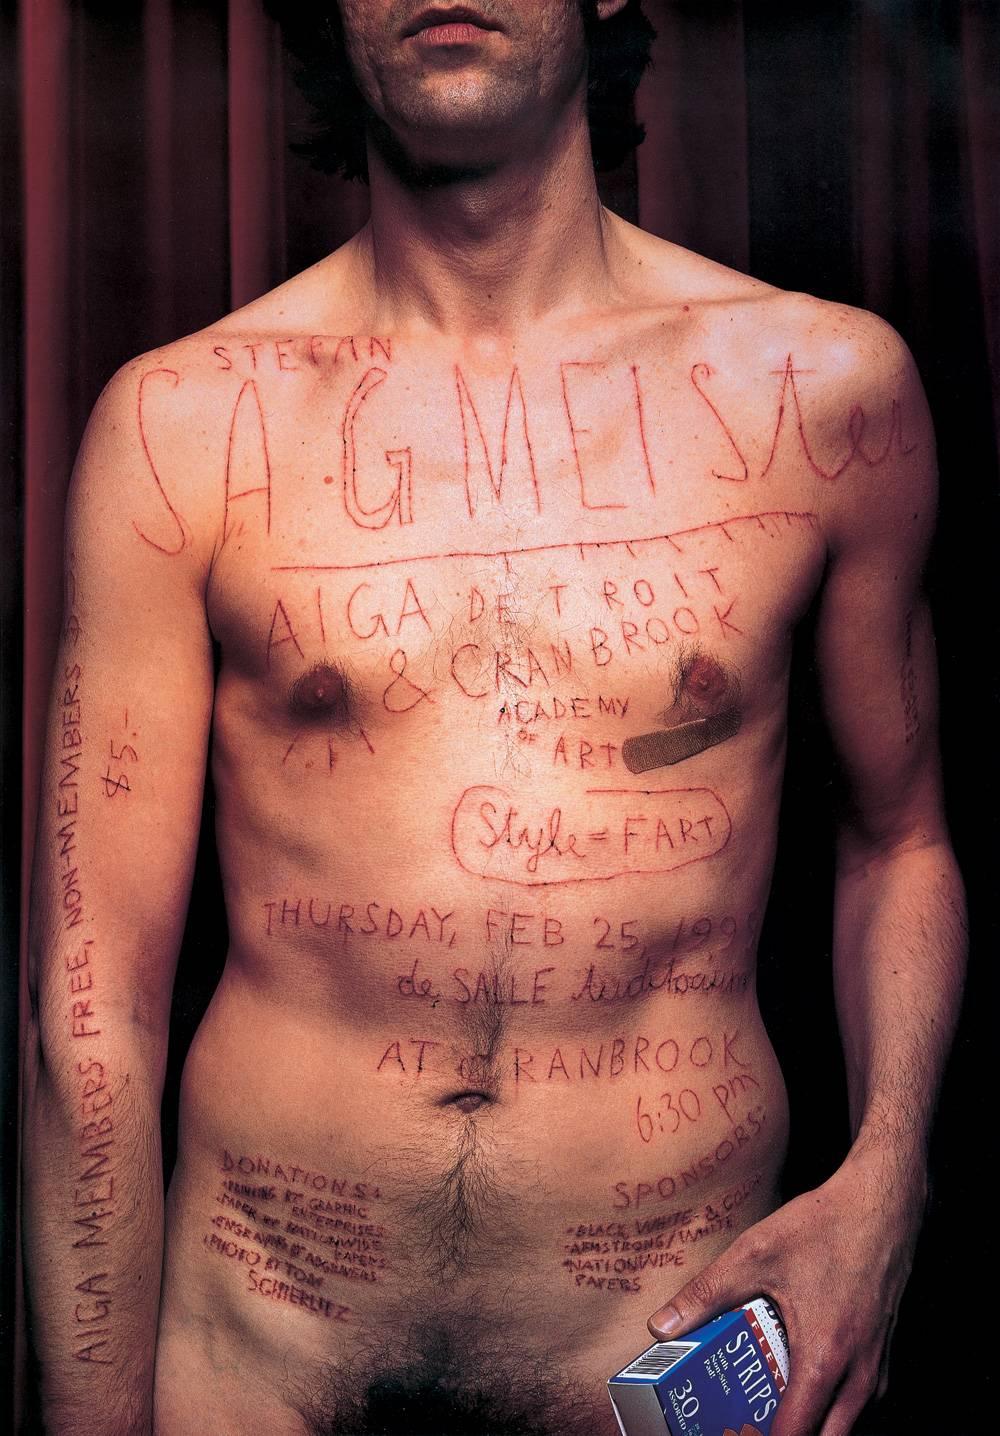 AIGA Detroit Poster